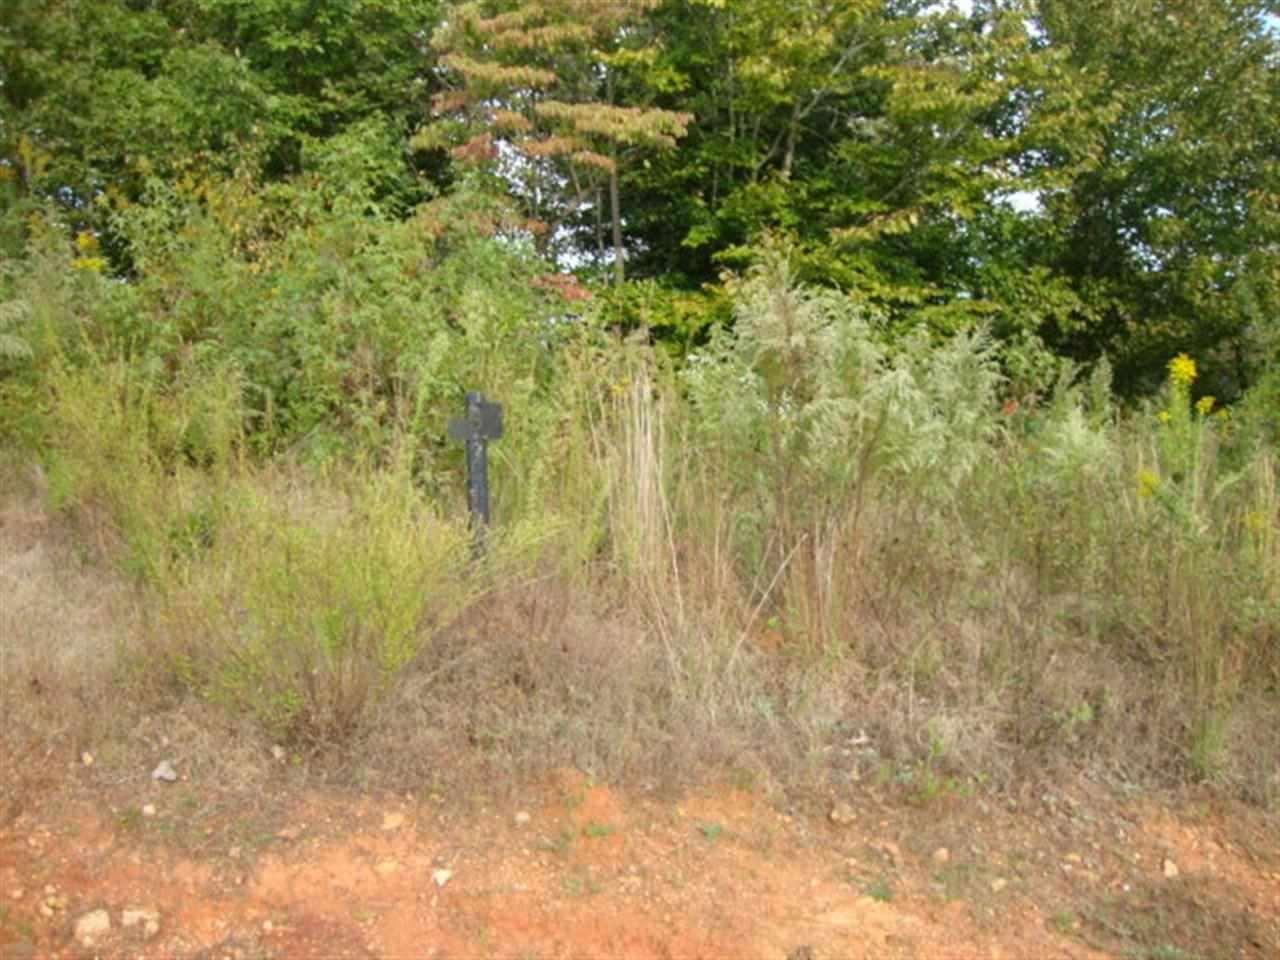 Real Estate for Sale, ListingId: 27554031, Powdersville,SC29673